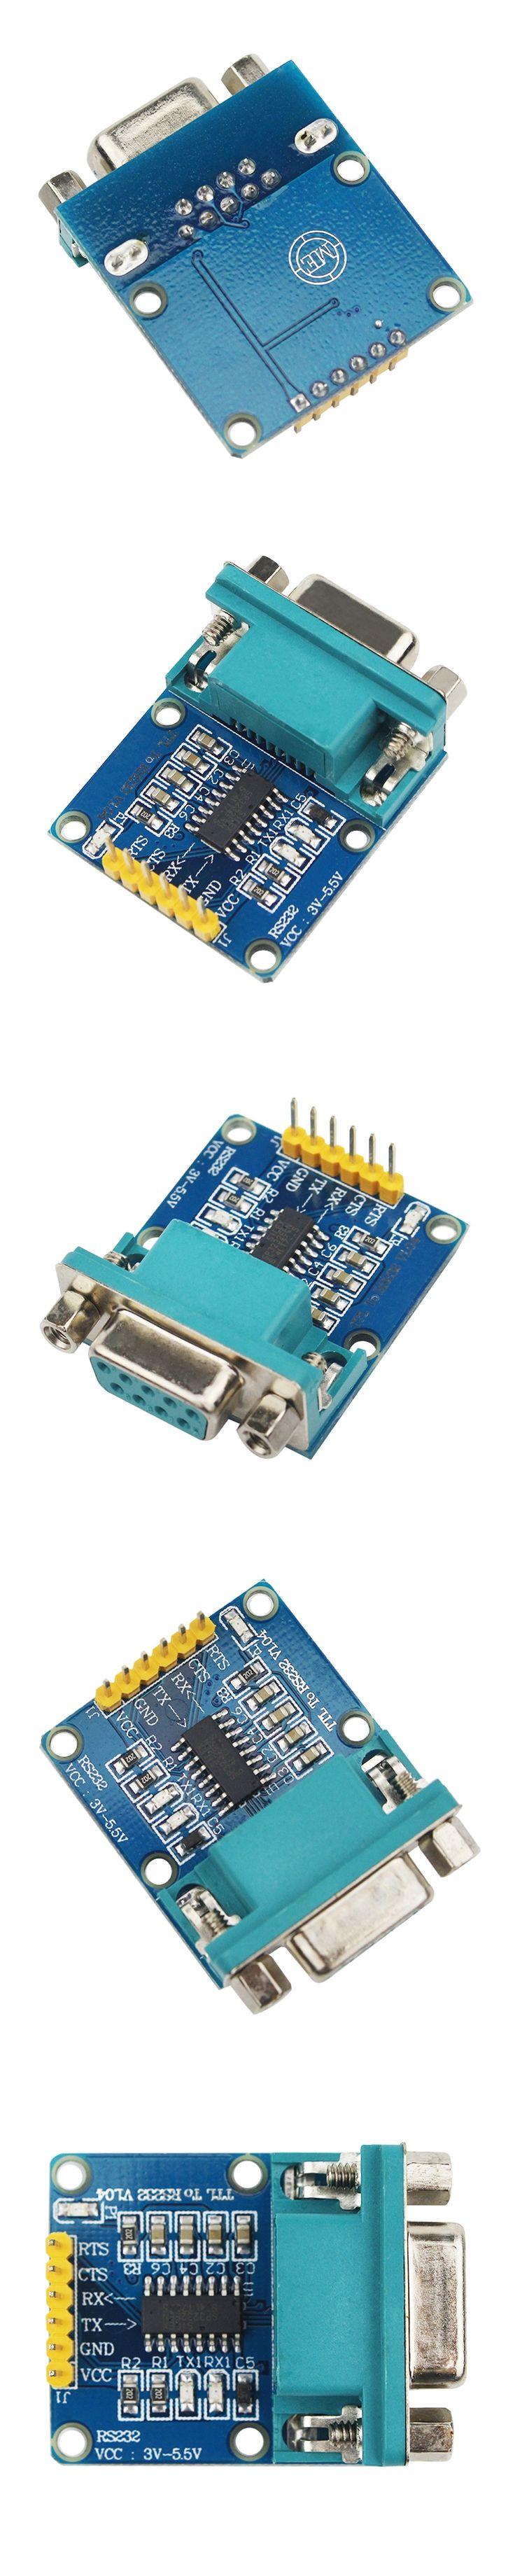 10pcs/lot RS232 to TTL Serial Port Converter Module